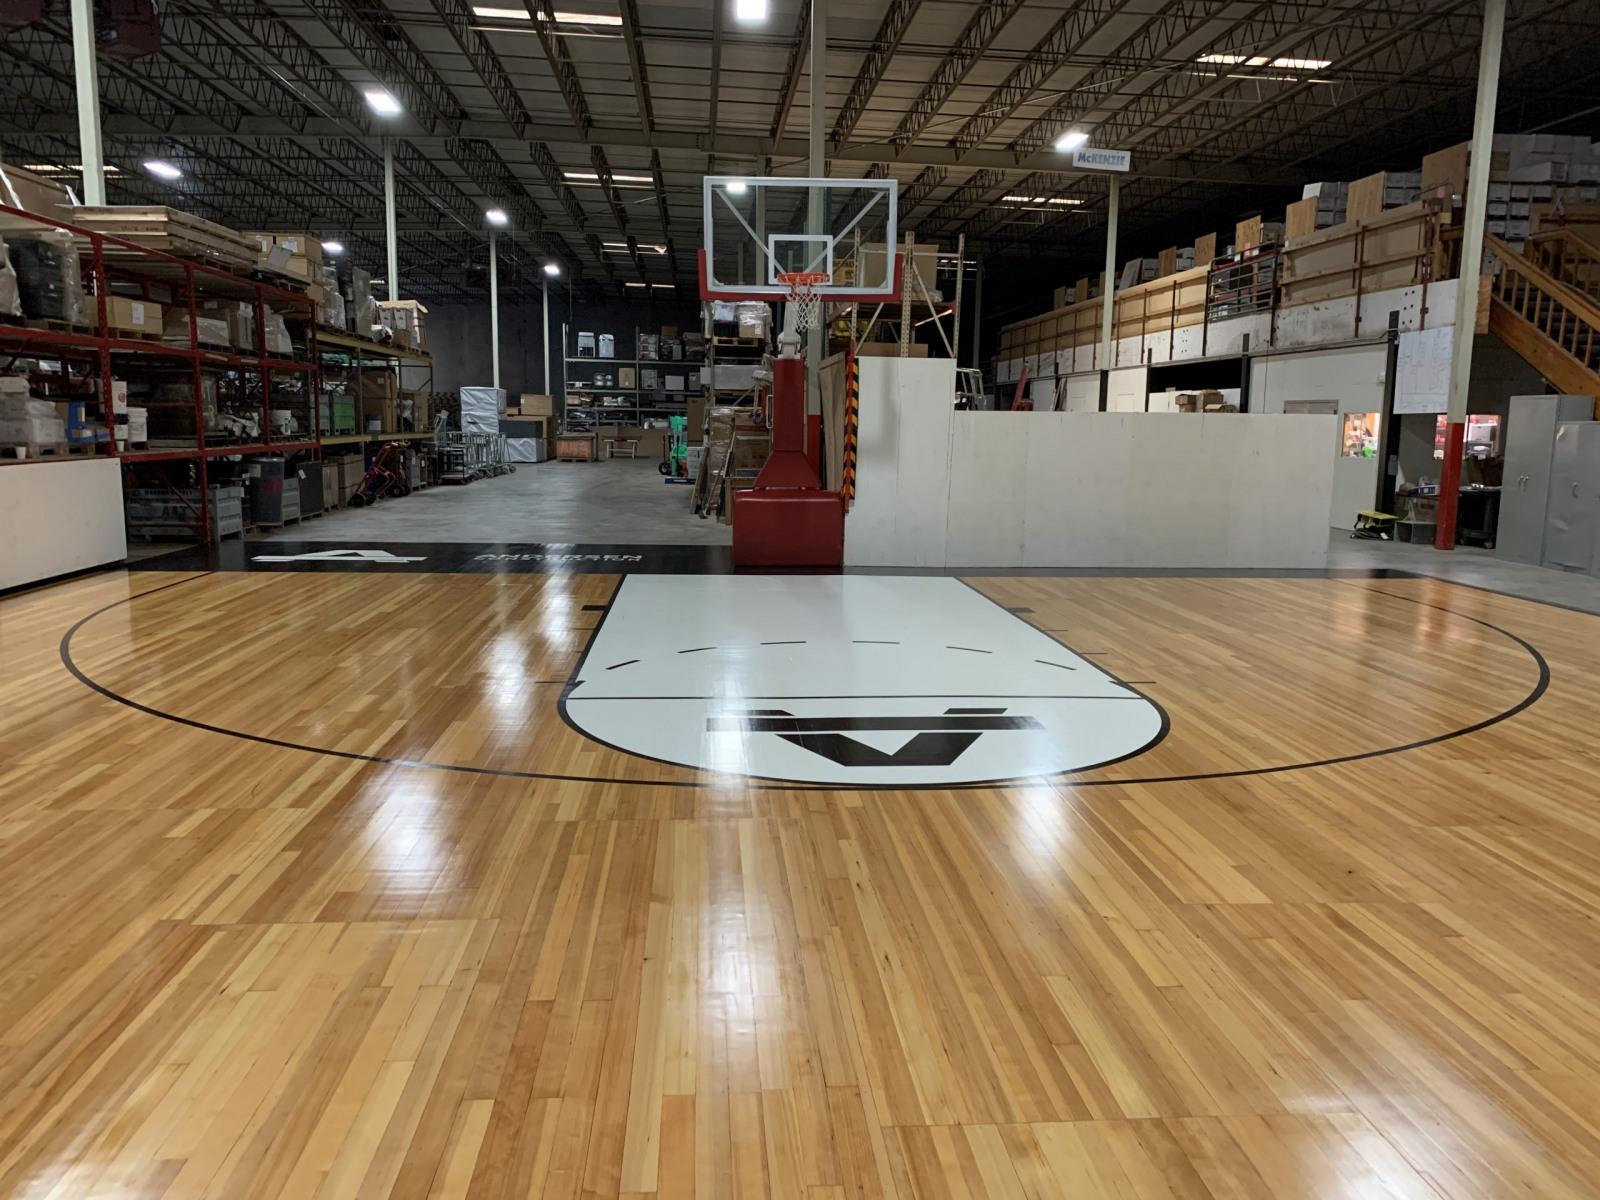 Reclaimed Basketball Court Flooring, Laminate Basketball Flooring